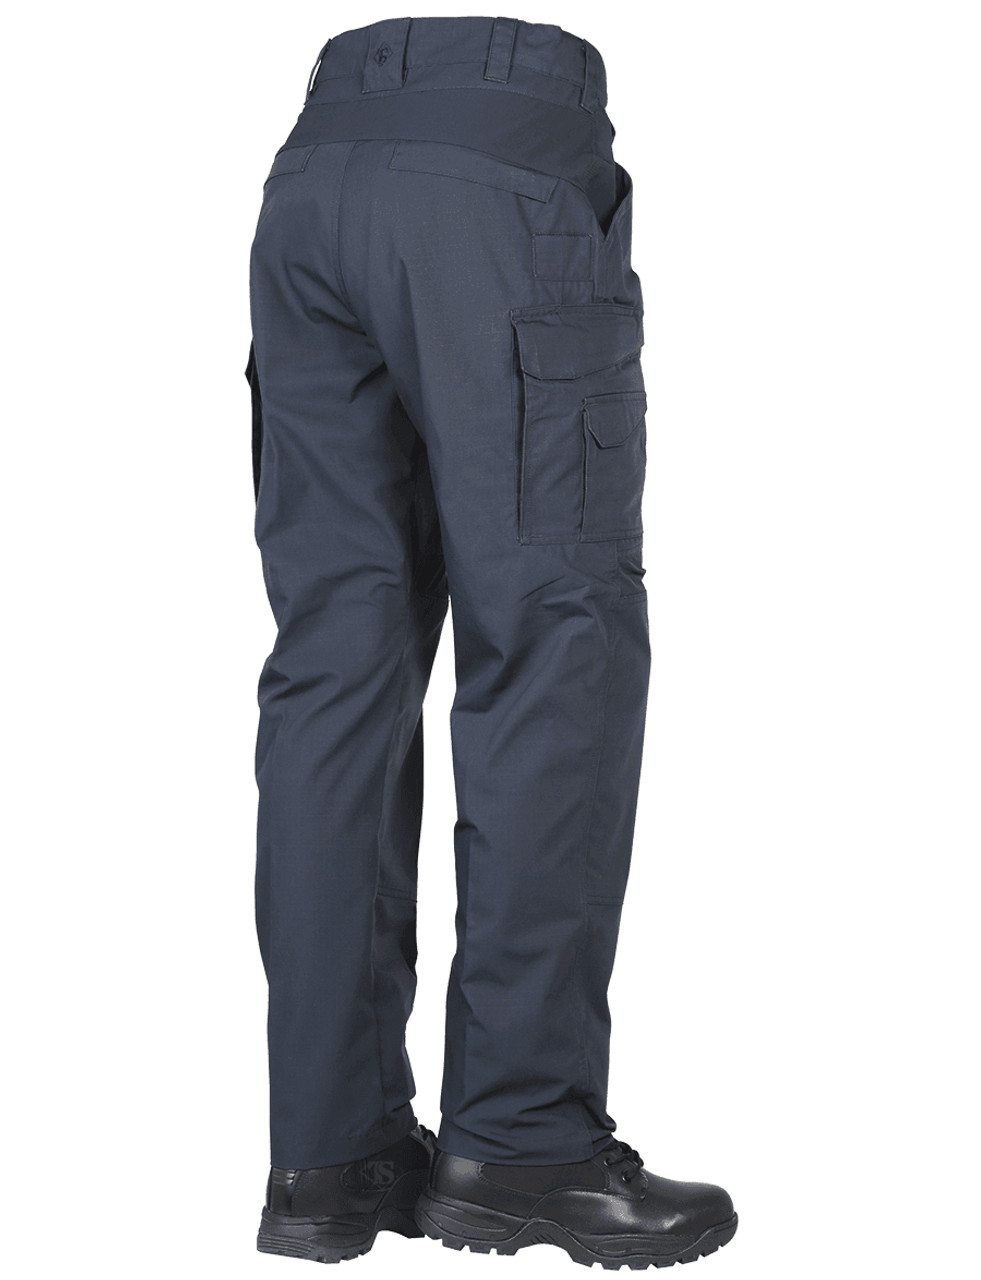 TRU-SPEC 24-7 Series Men/'s Original Tactical Pants PREMIUM Duty-Grade RIP-STOP